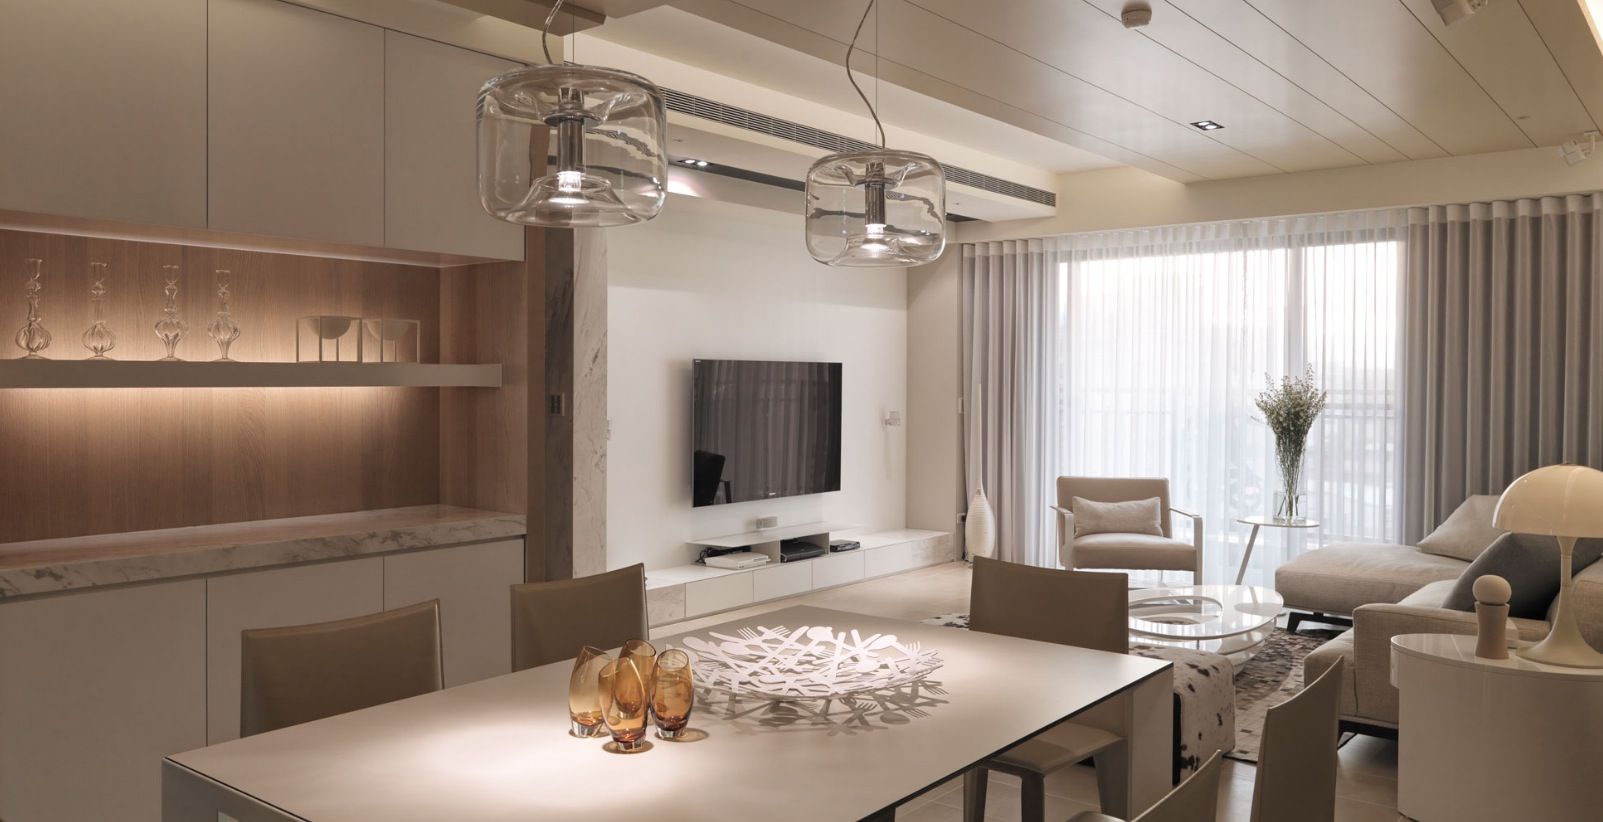 Mini appartamenti 5 soluzioni sorprendenti dai 40 ai 50 for Mini arredo bisceglie